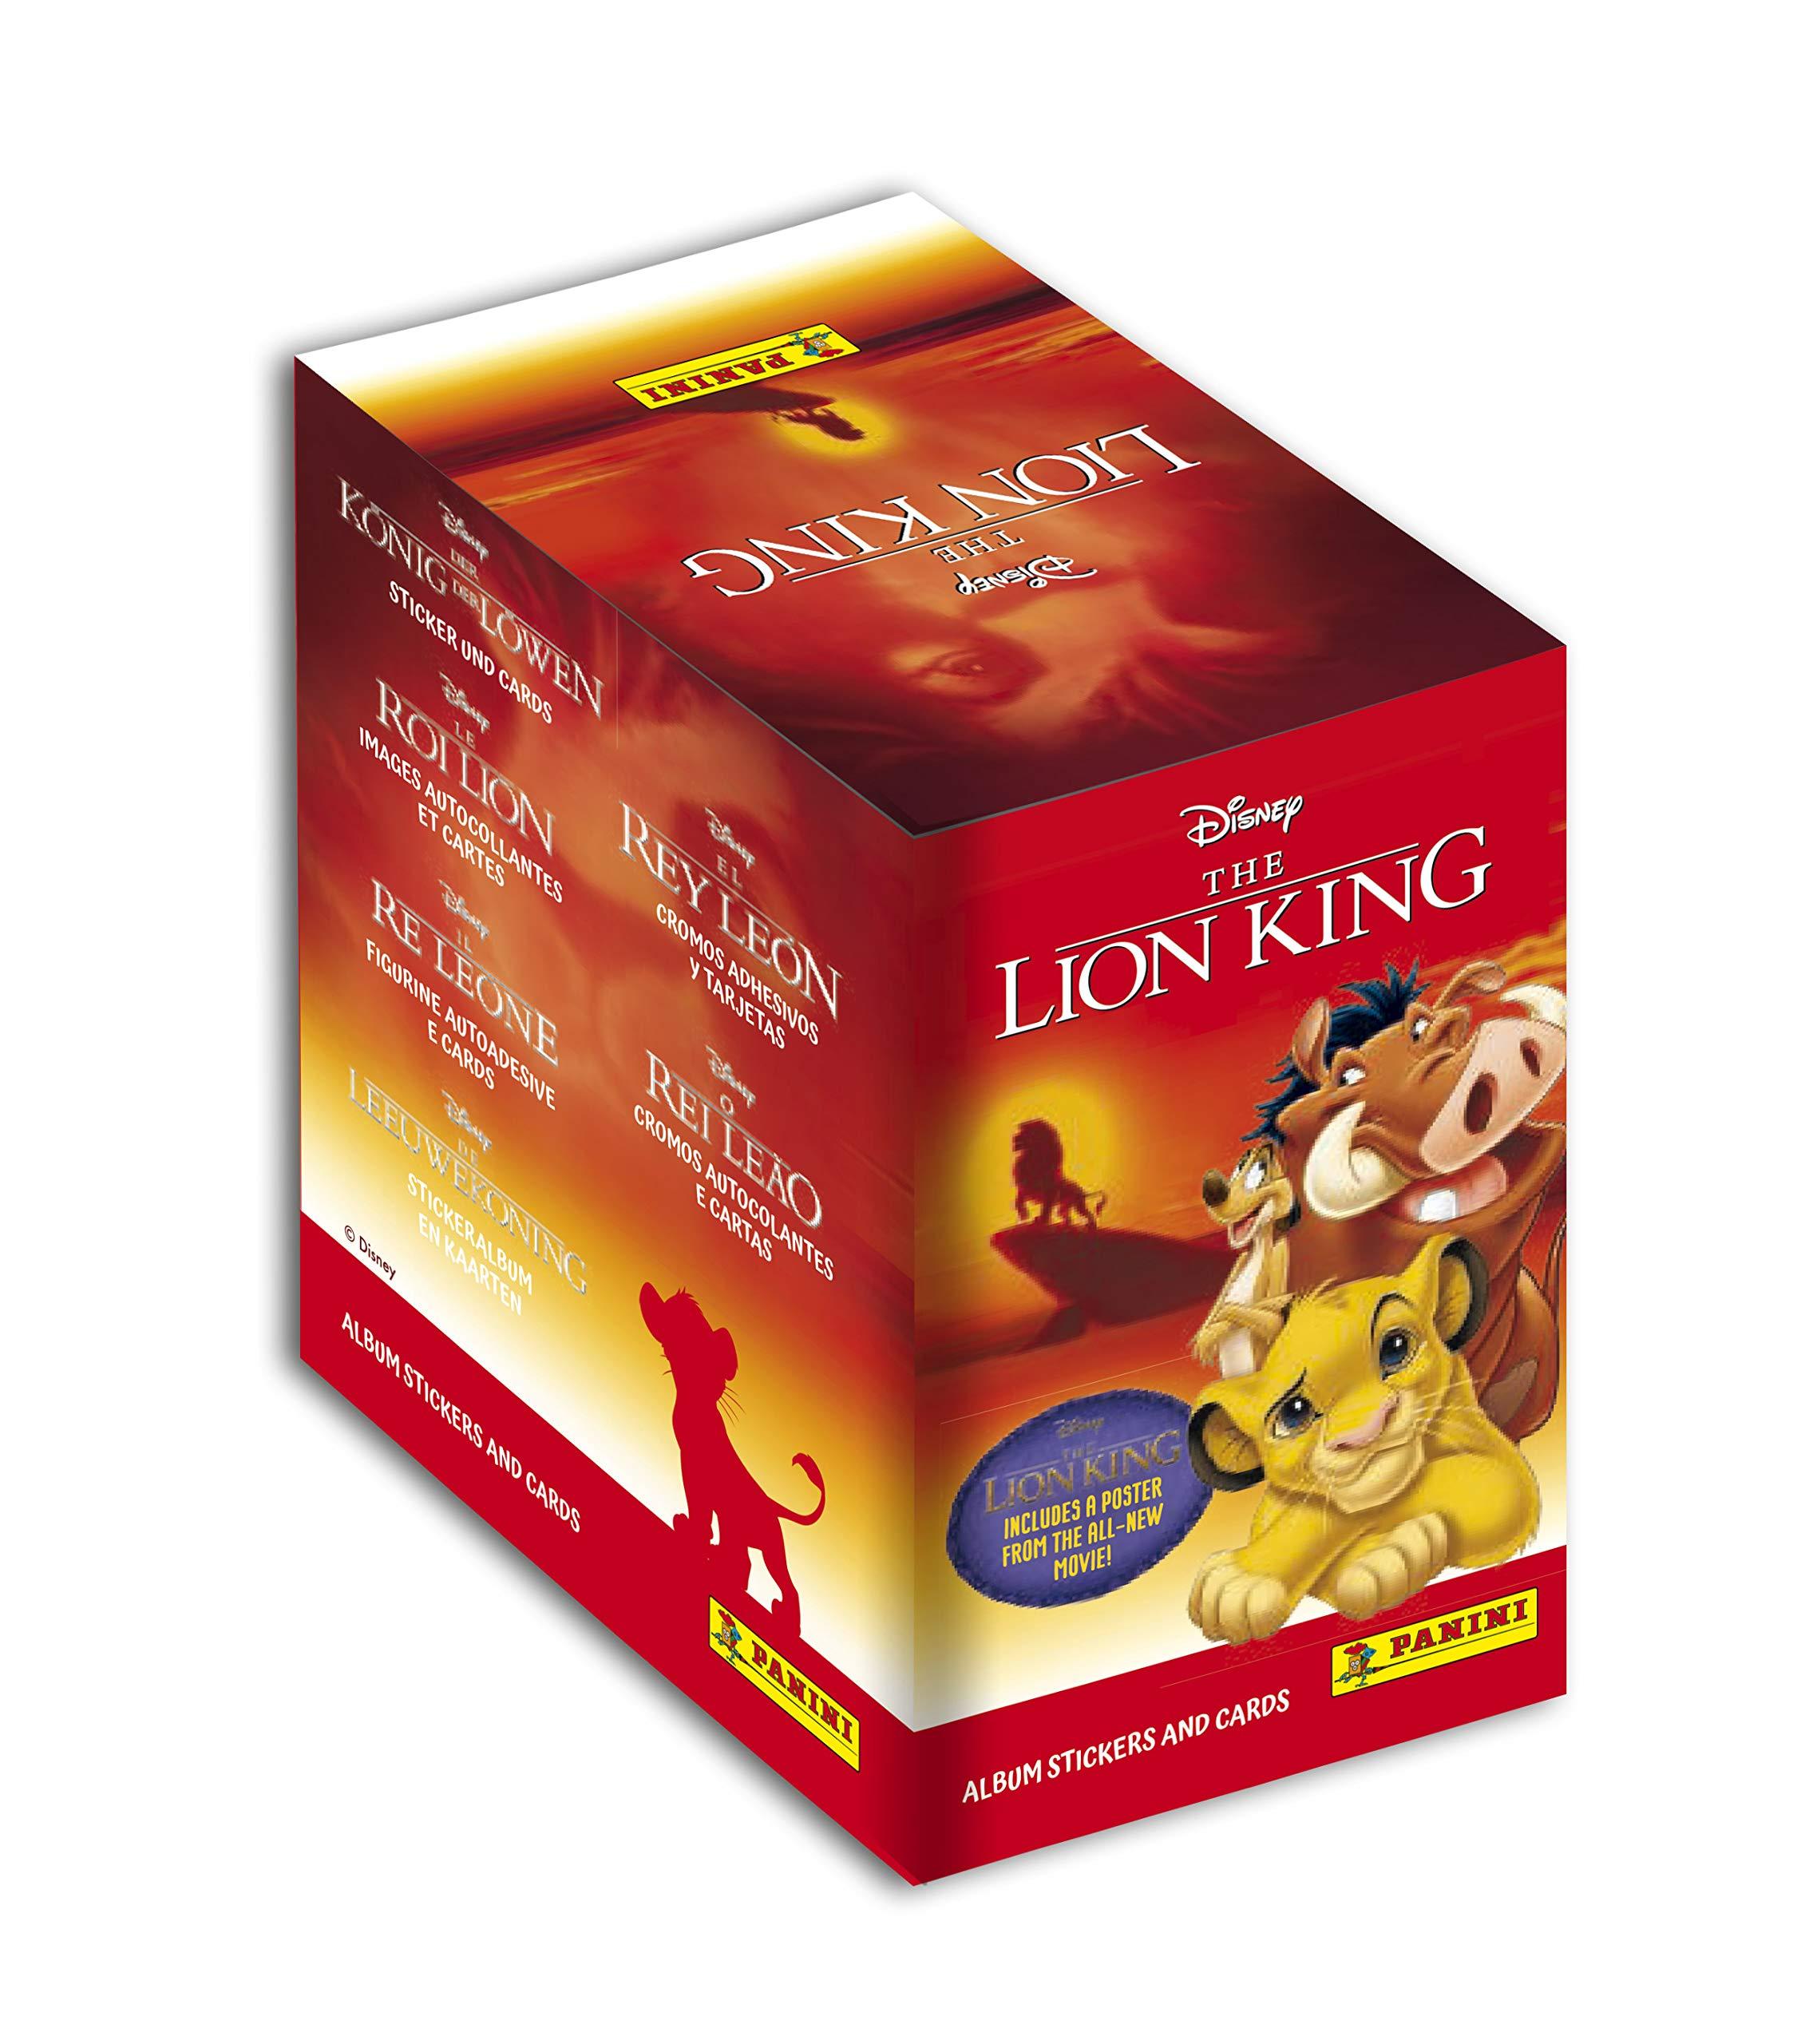 Panini France SA-LE Rei Leon (classic) - Caja de 50 bolsillos, 2521-004: Amazon.es: Juguetes y juegos